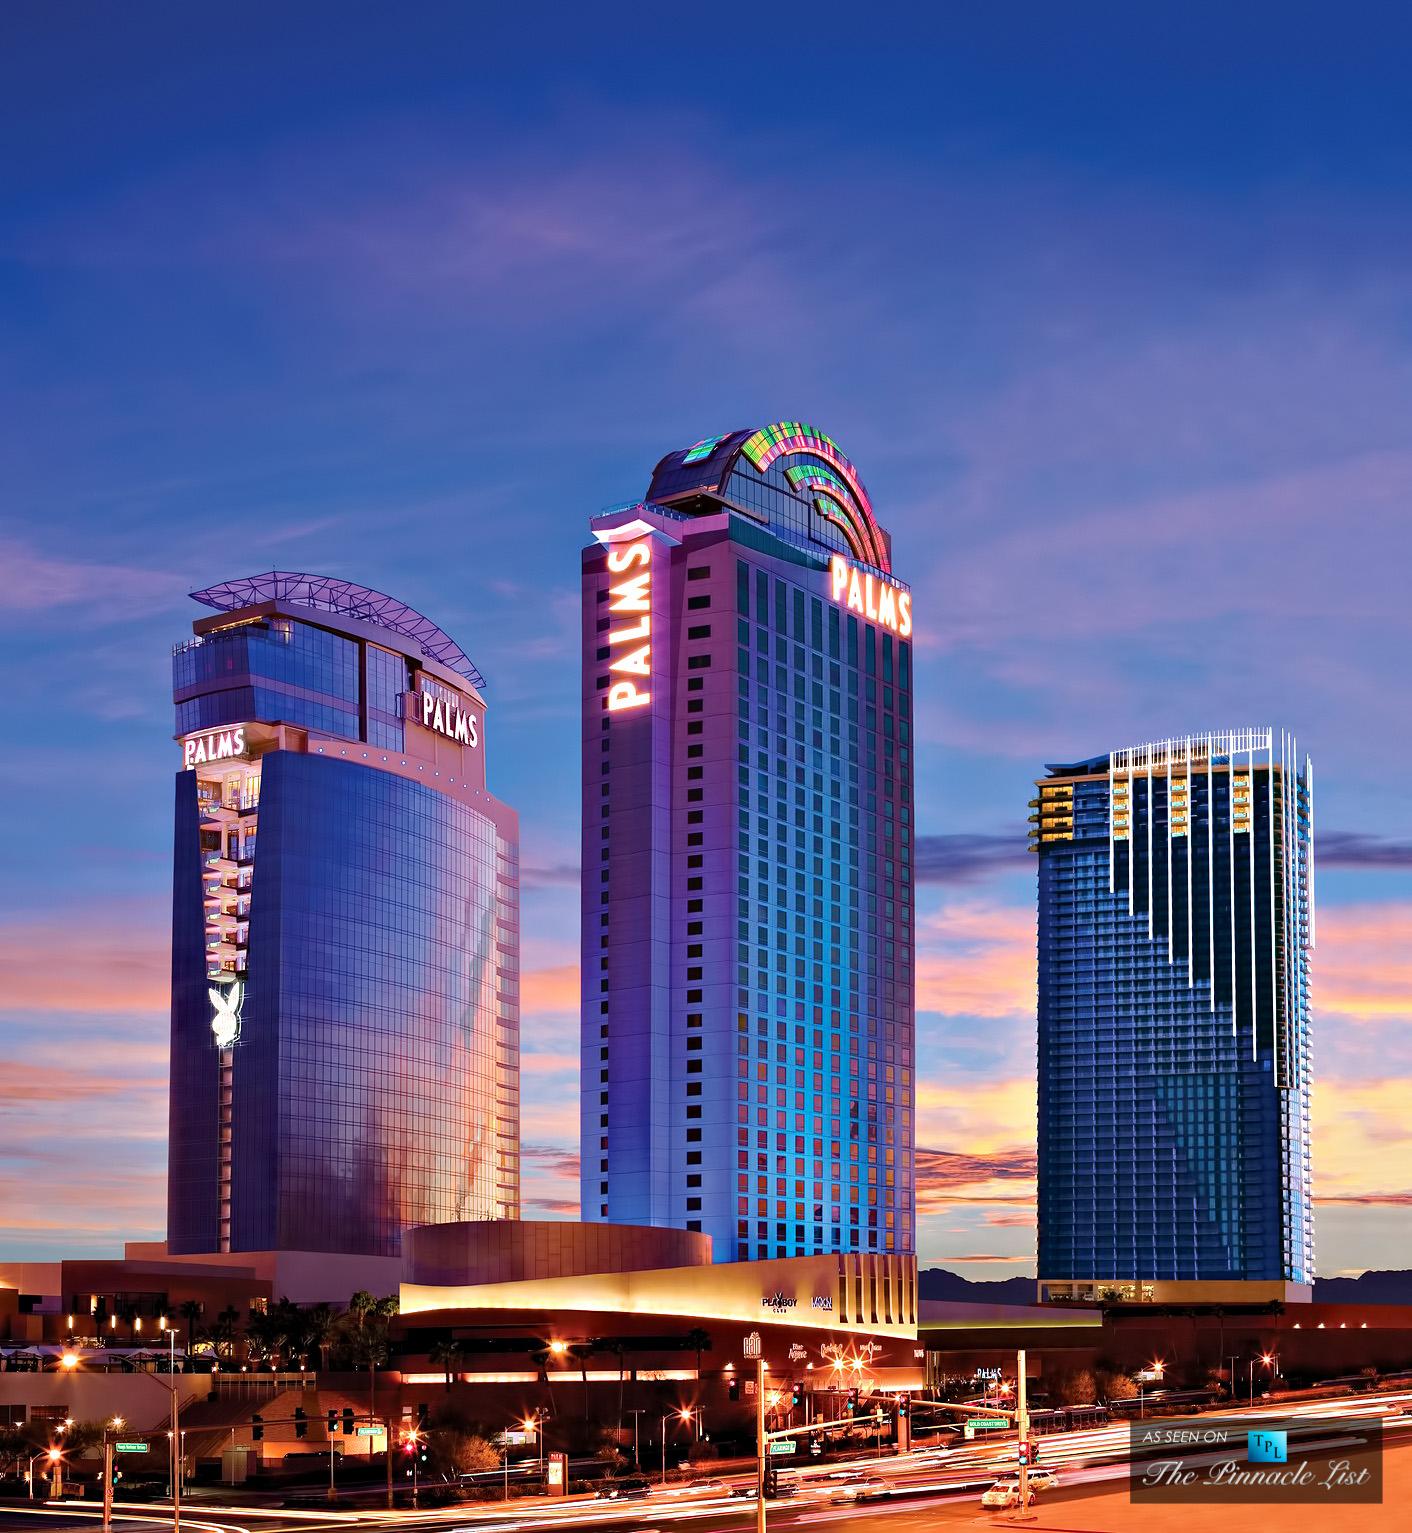 Palms Casino Resort - 4321 W Flamingo Rd, Las Vegas, NV 89103, United States